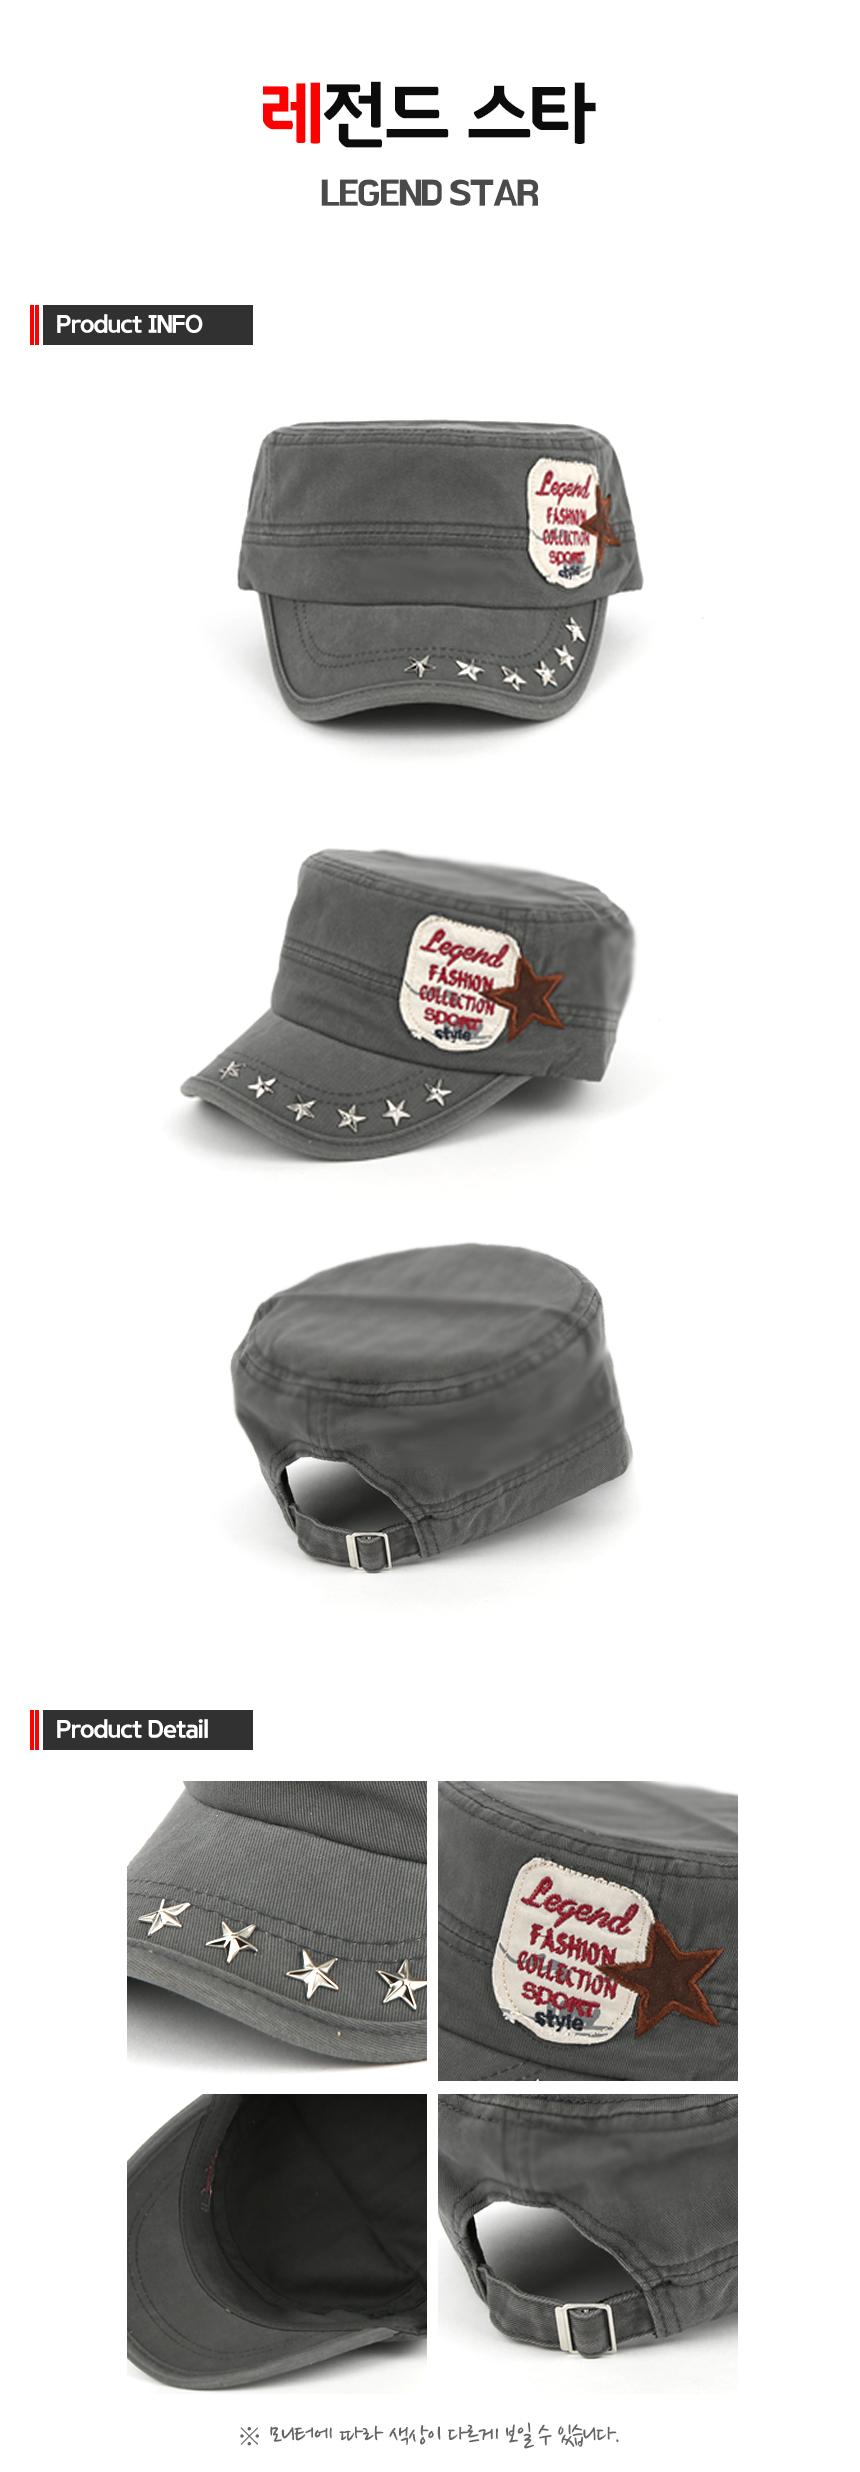 b1c868f58bb 오시오] 레전드스타 남자 여자 야구 캡 모자 브랜드 종류 볼캡 - 11번가